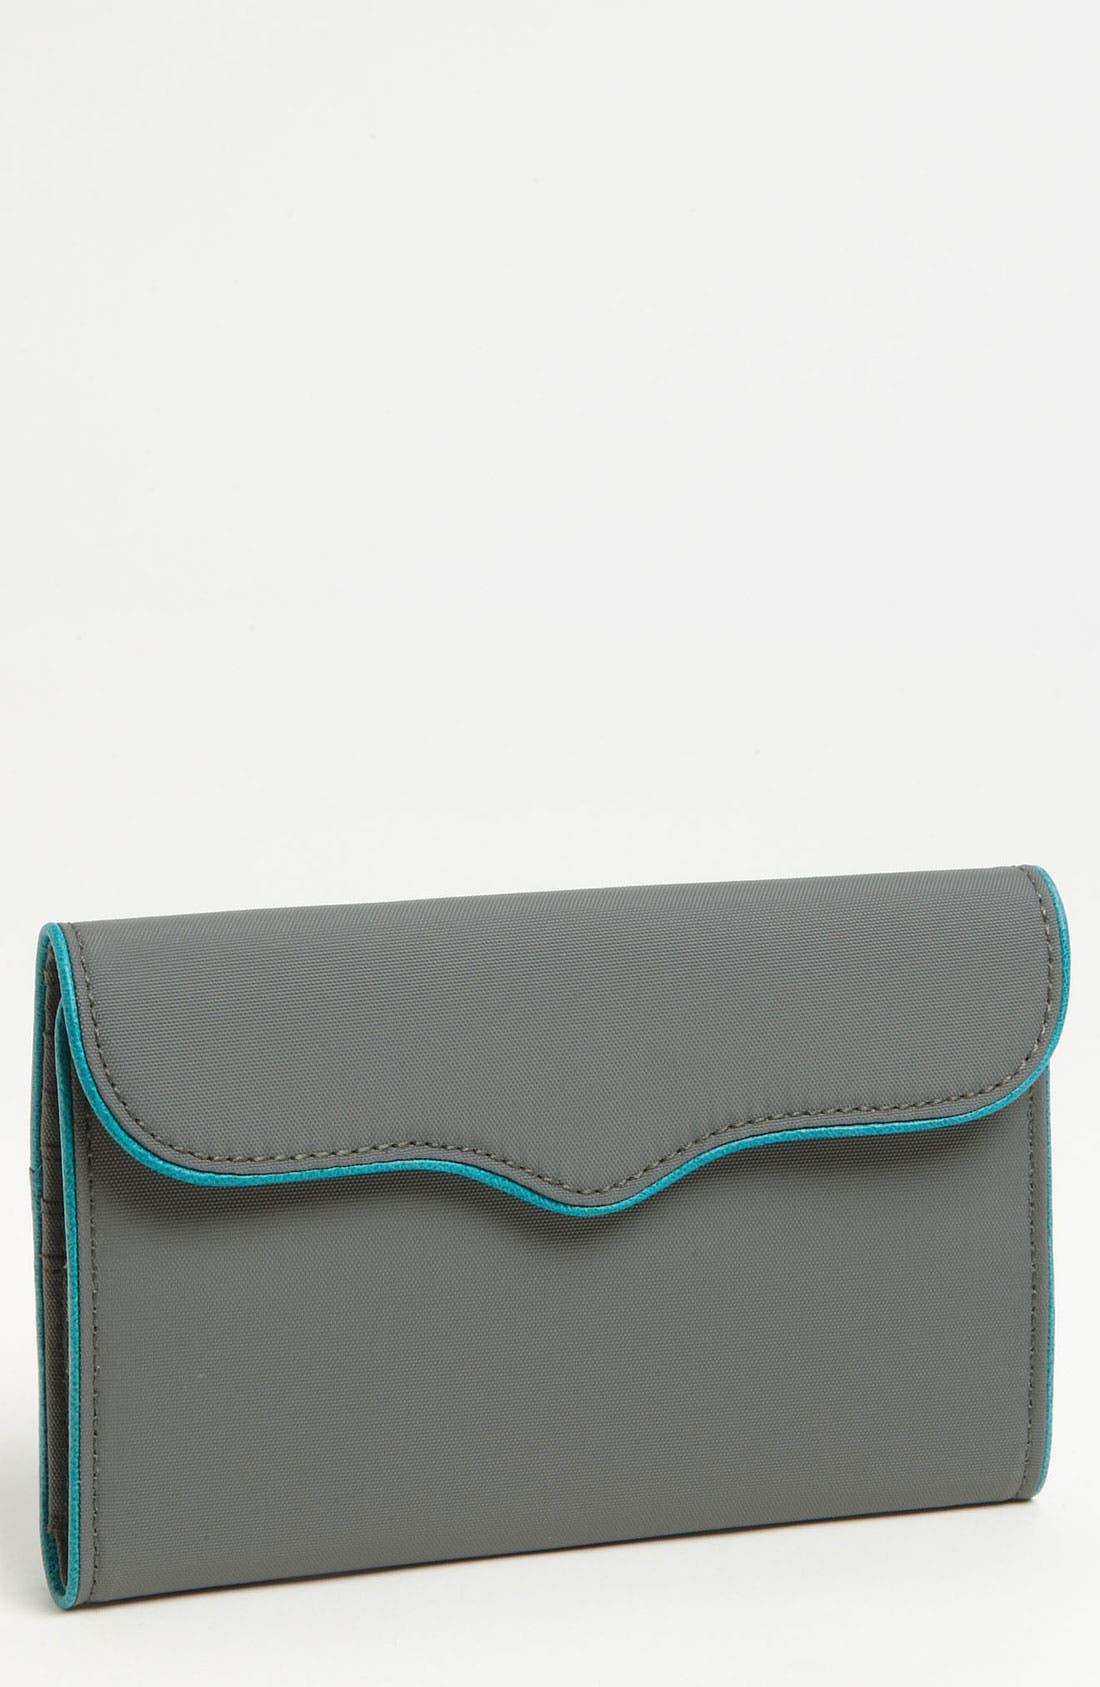 Alternate Image 1 Selected - Rebecca Minkoff Coated Nylon Passport Wallet